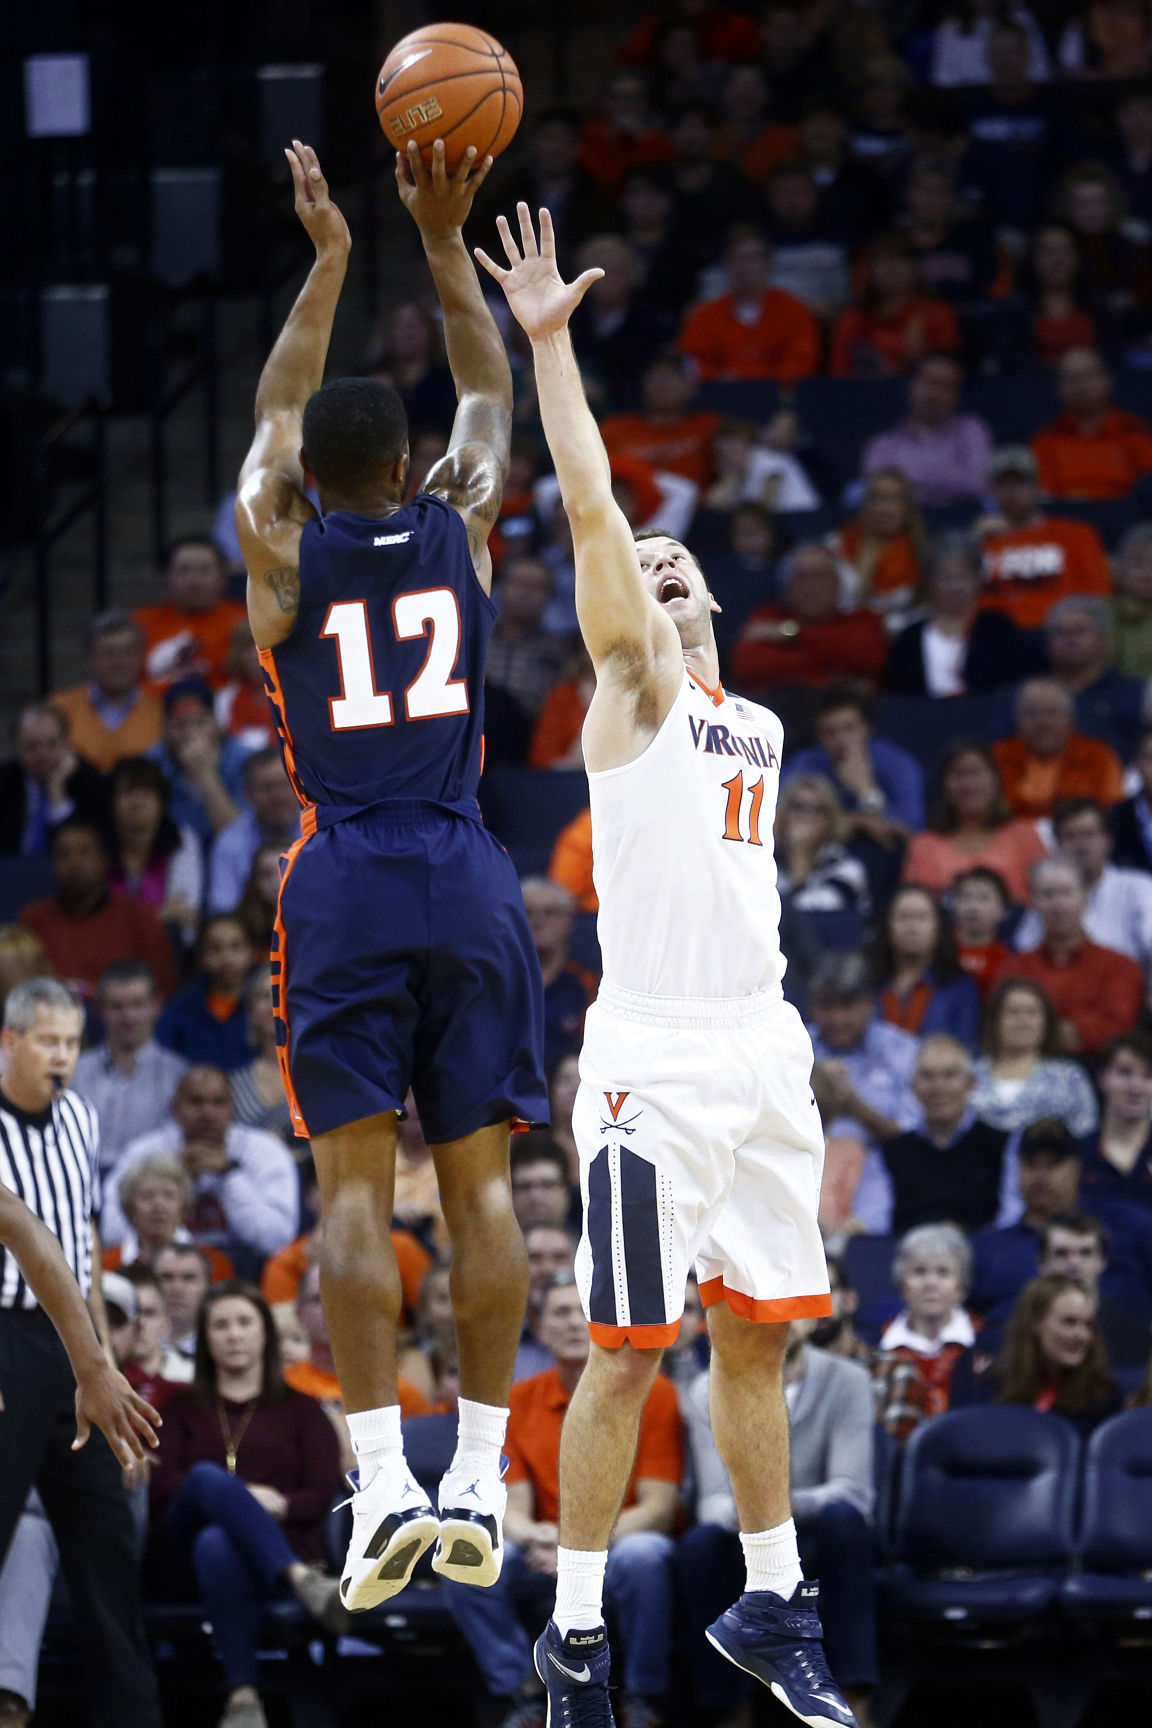 UVA vs. Morgan State basketball photos | Galleries | dailyprogress.com